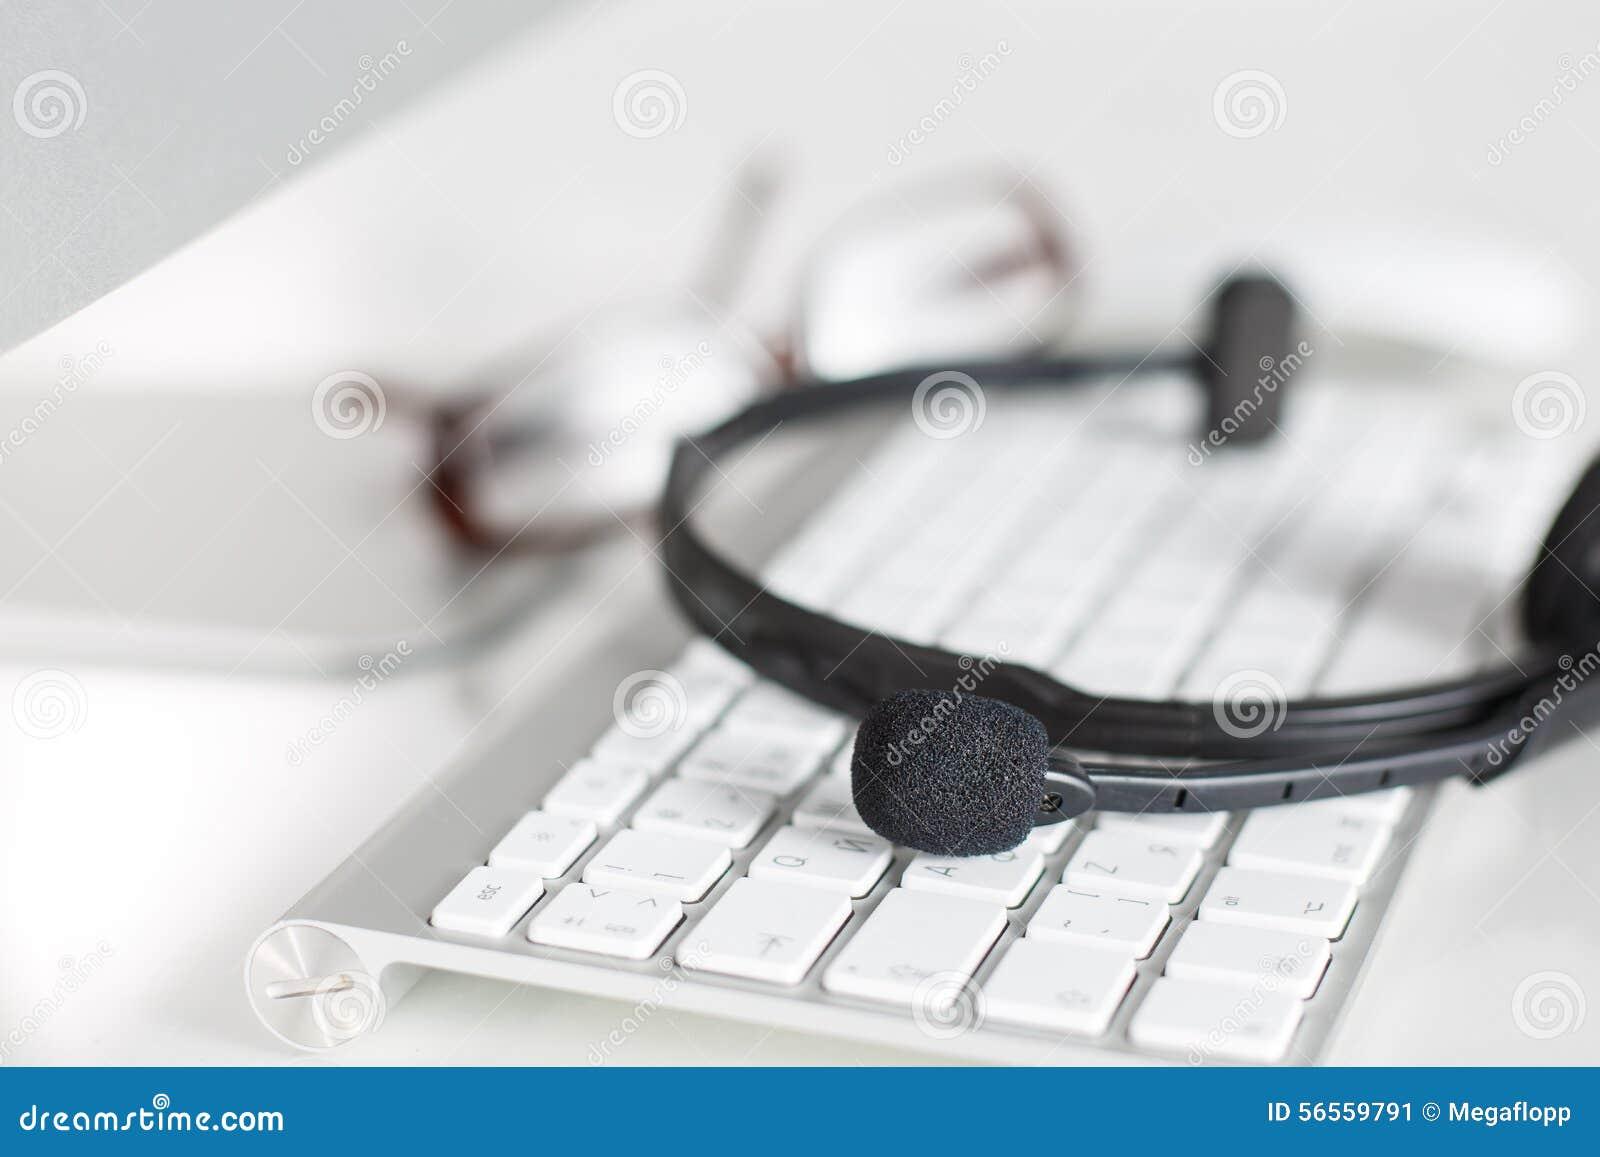 Download Κενή θέση εργασίας του χειριστή υπηρεσιών τηλεφωνικών κέντρων Στοκ Εικόνα - εικόνα από μικρόφωνο, διαδίκτυο: 56559791